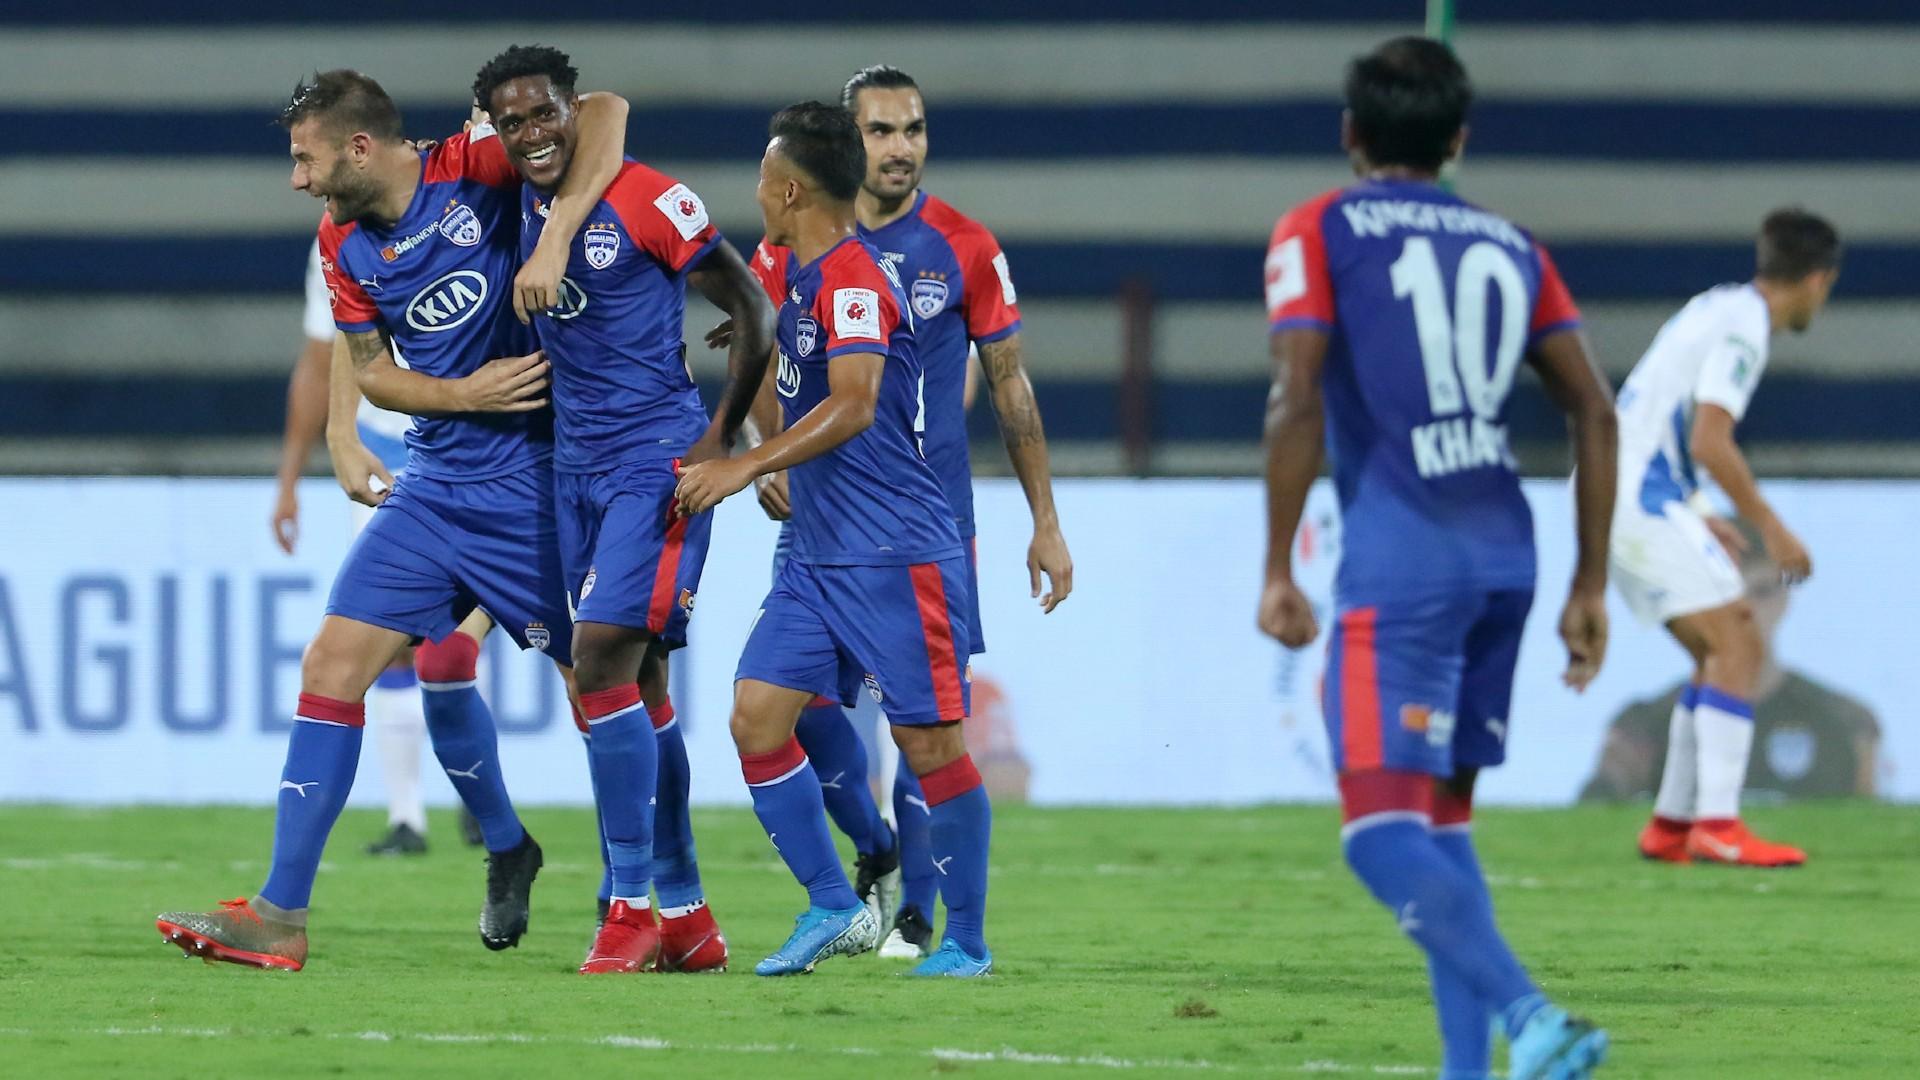 ISL 2019-20: Bengaluru FC vs Hyderabad FC - TV channel, stream, kick-off time & match preview